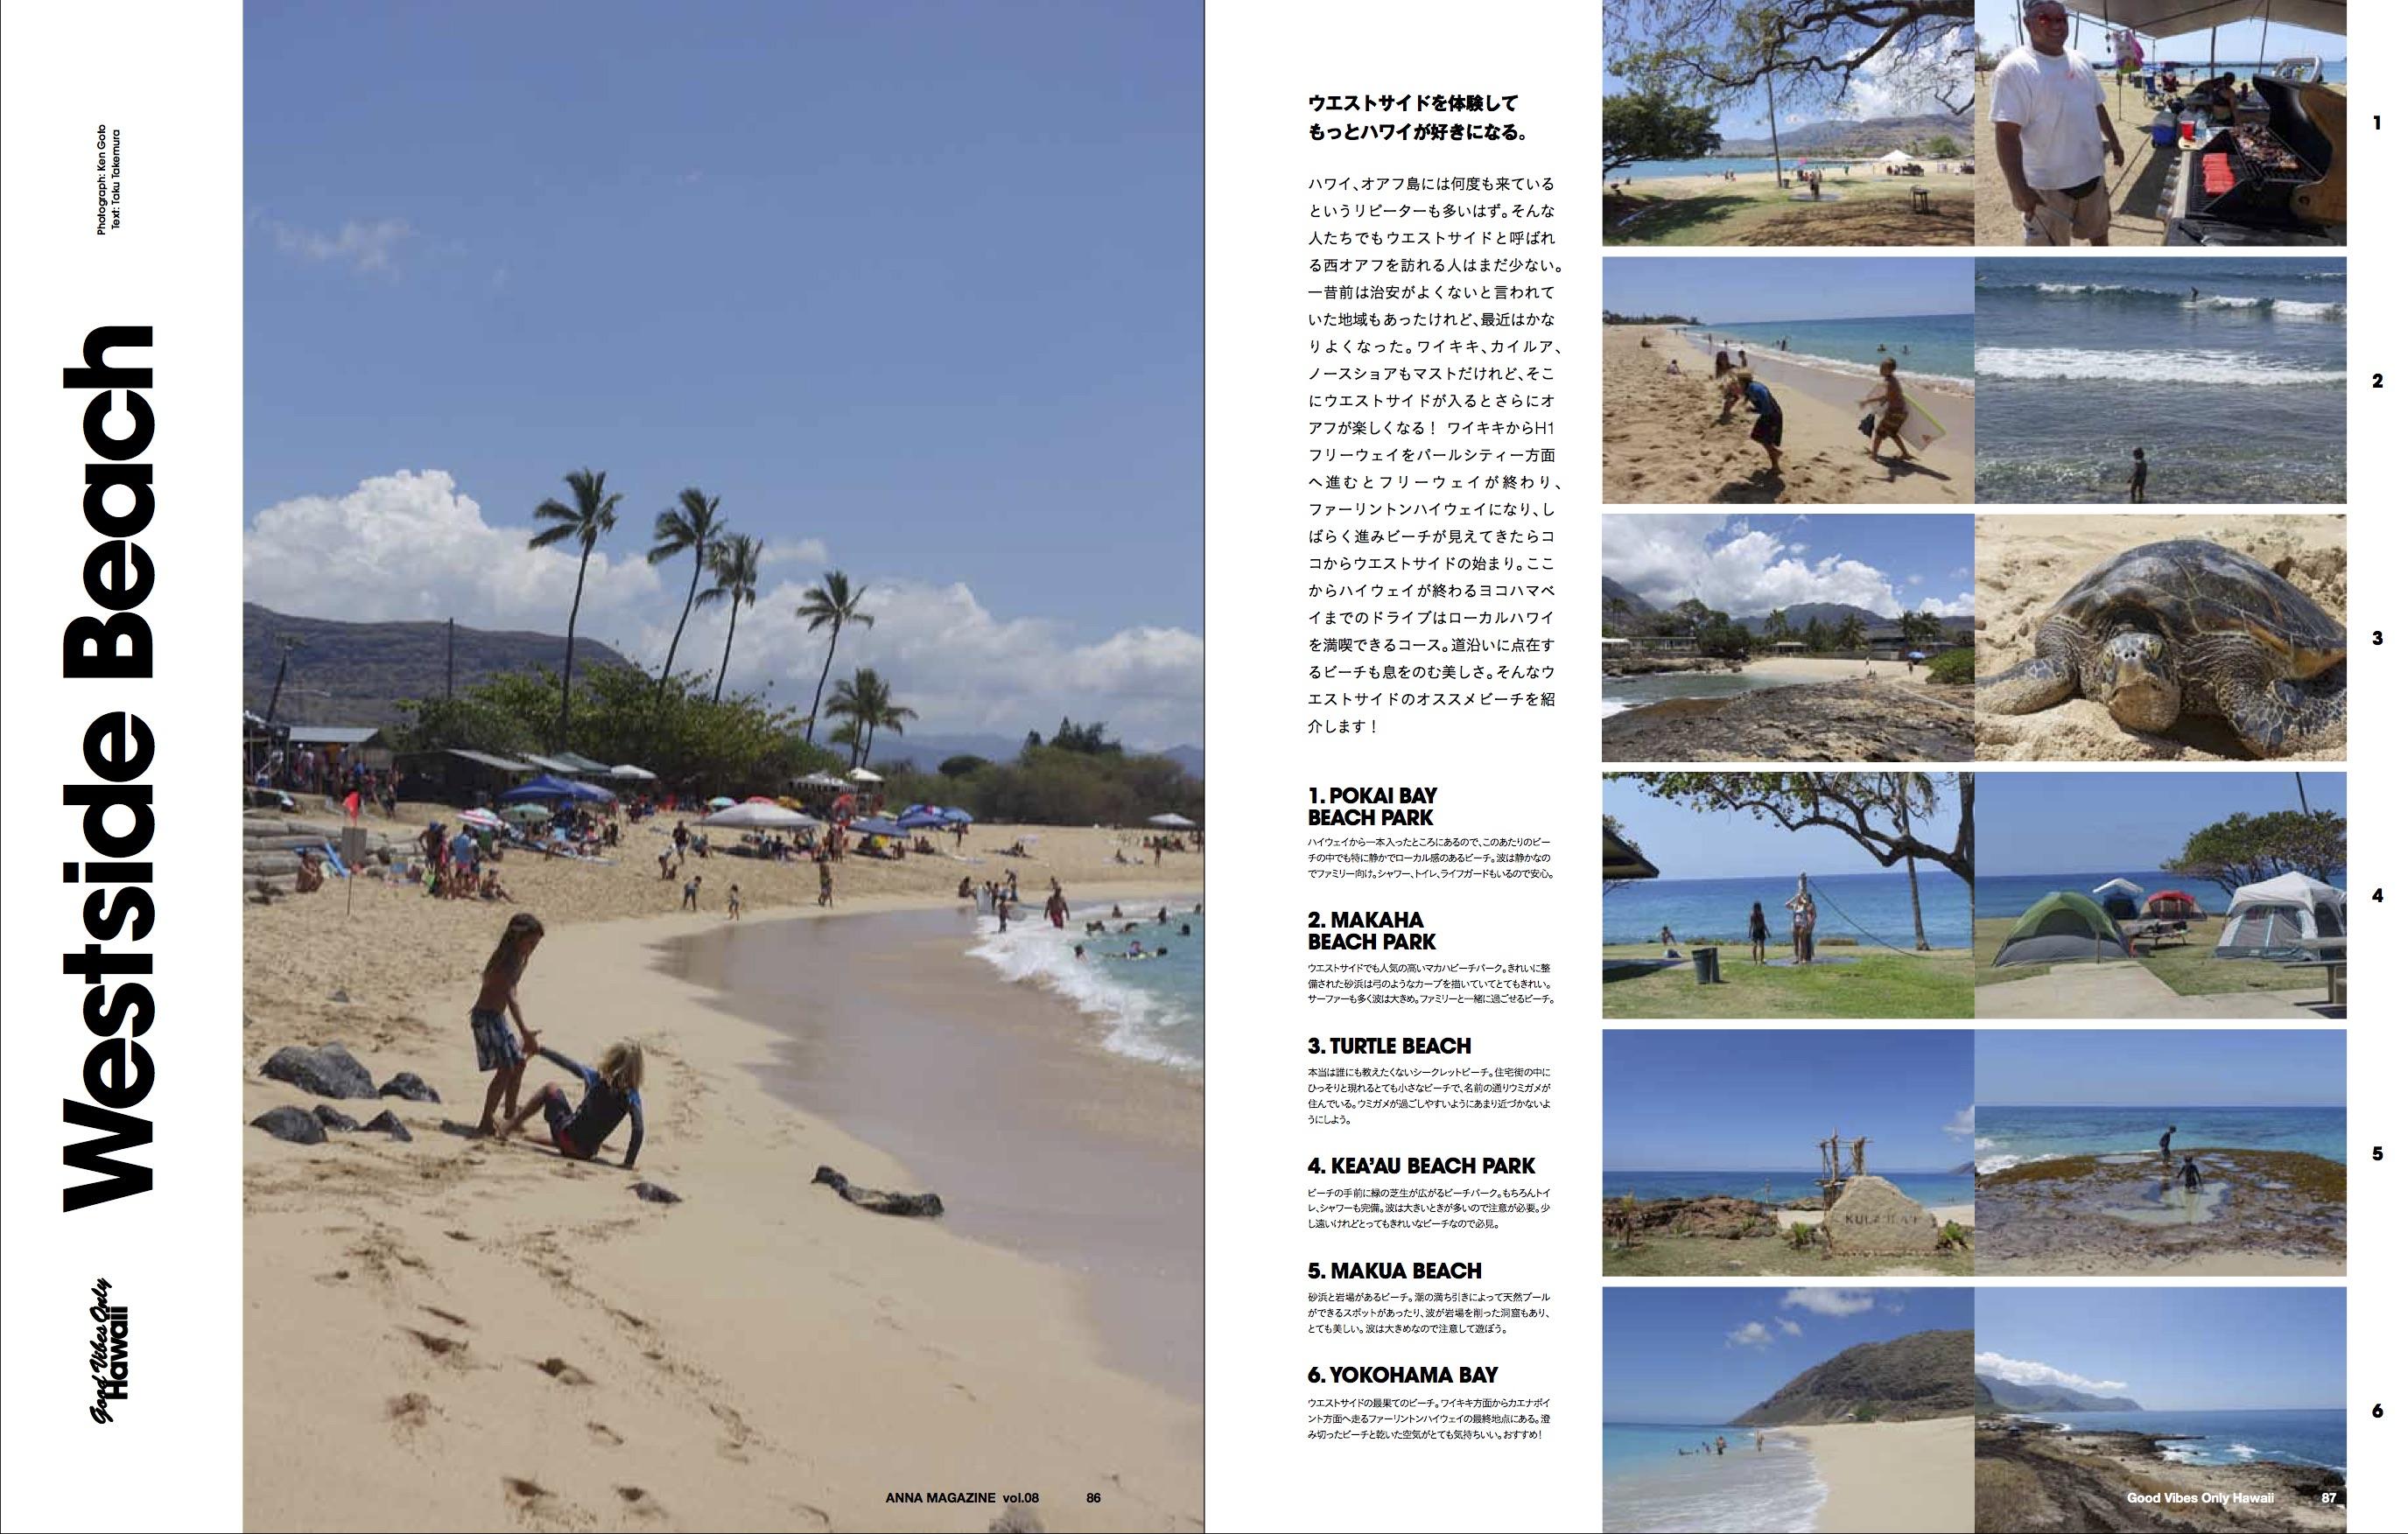 anna magazine vol.8 P41